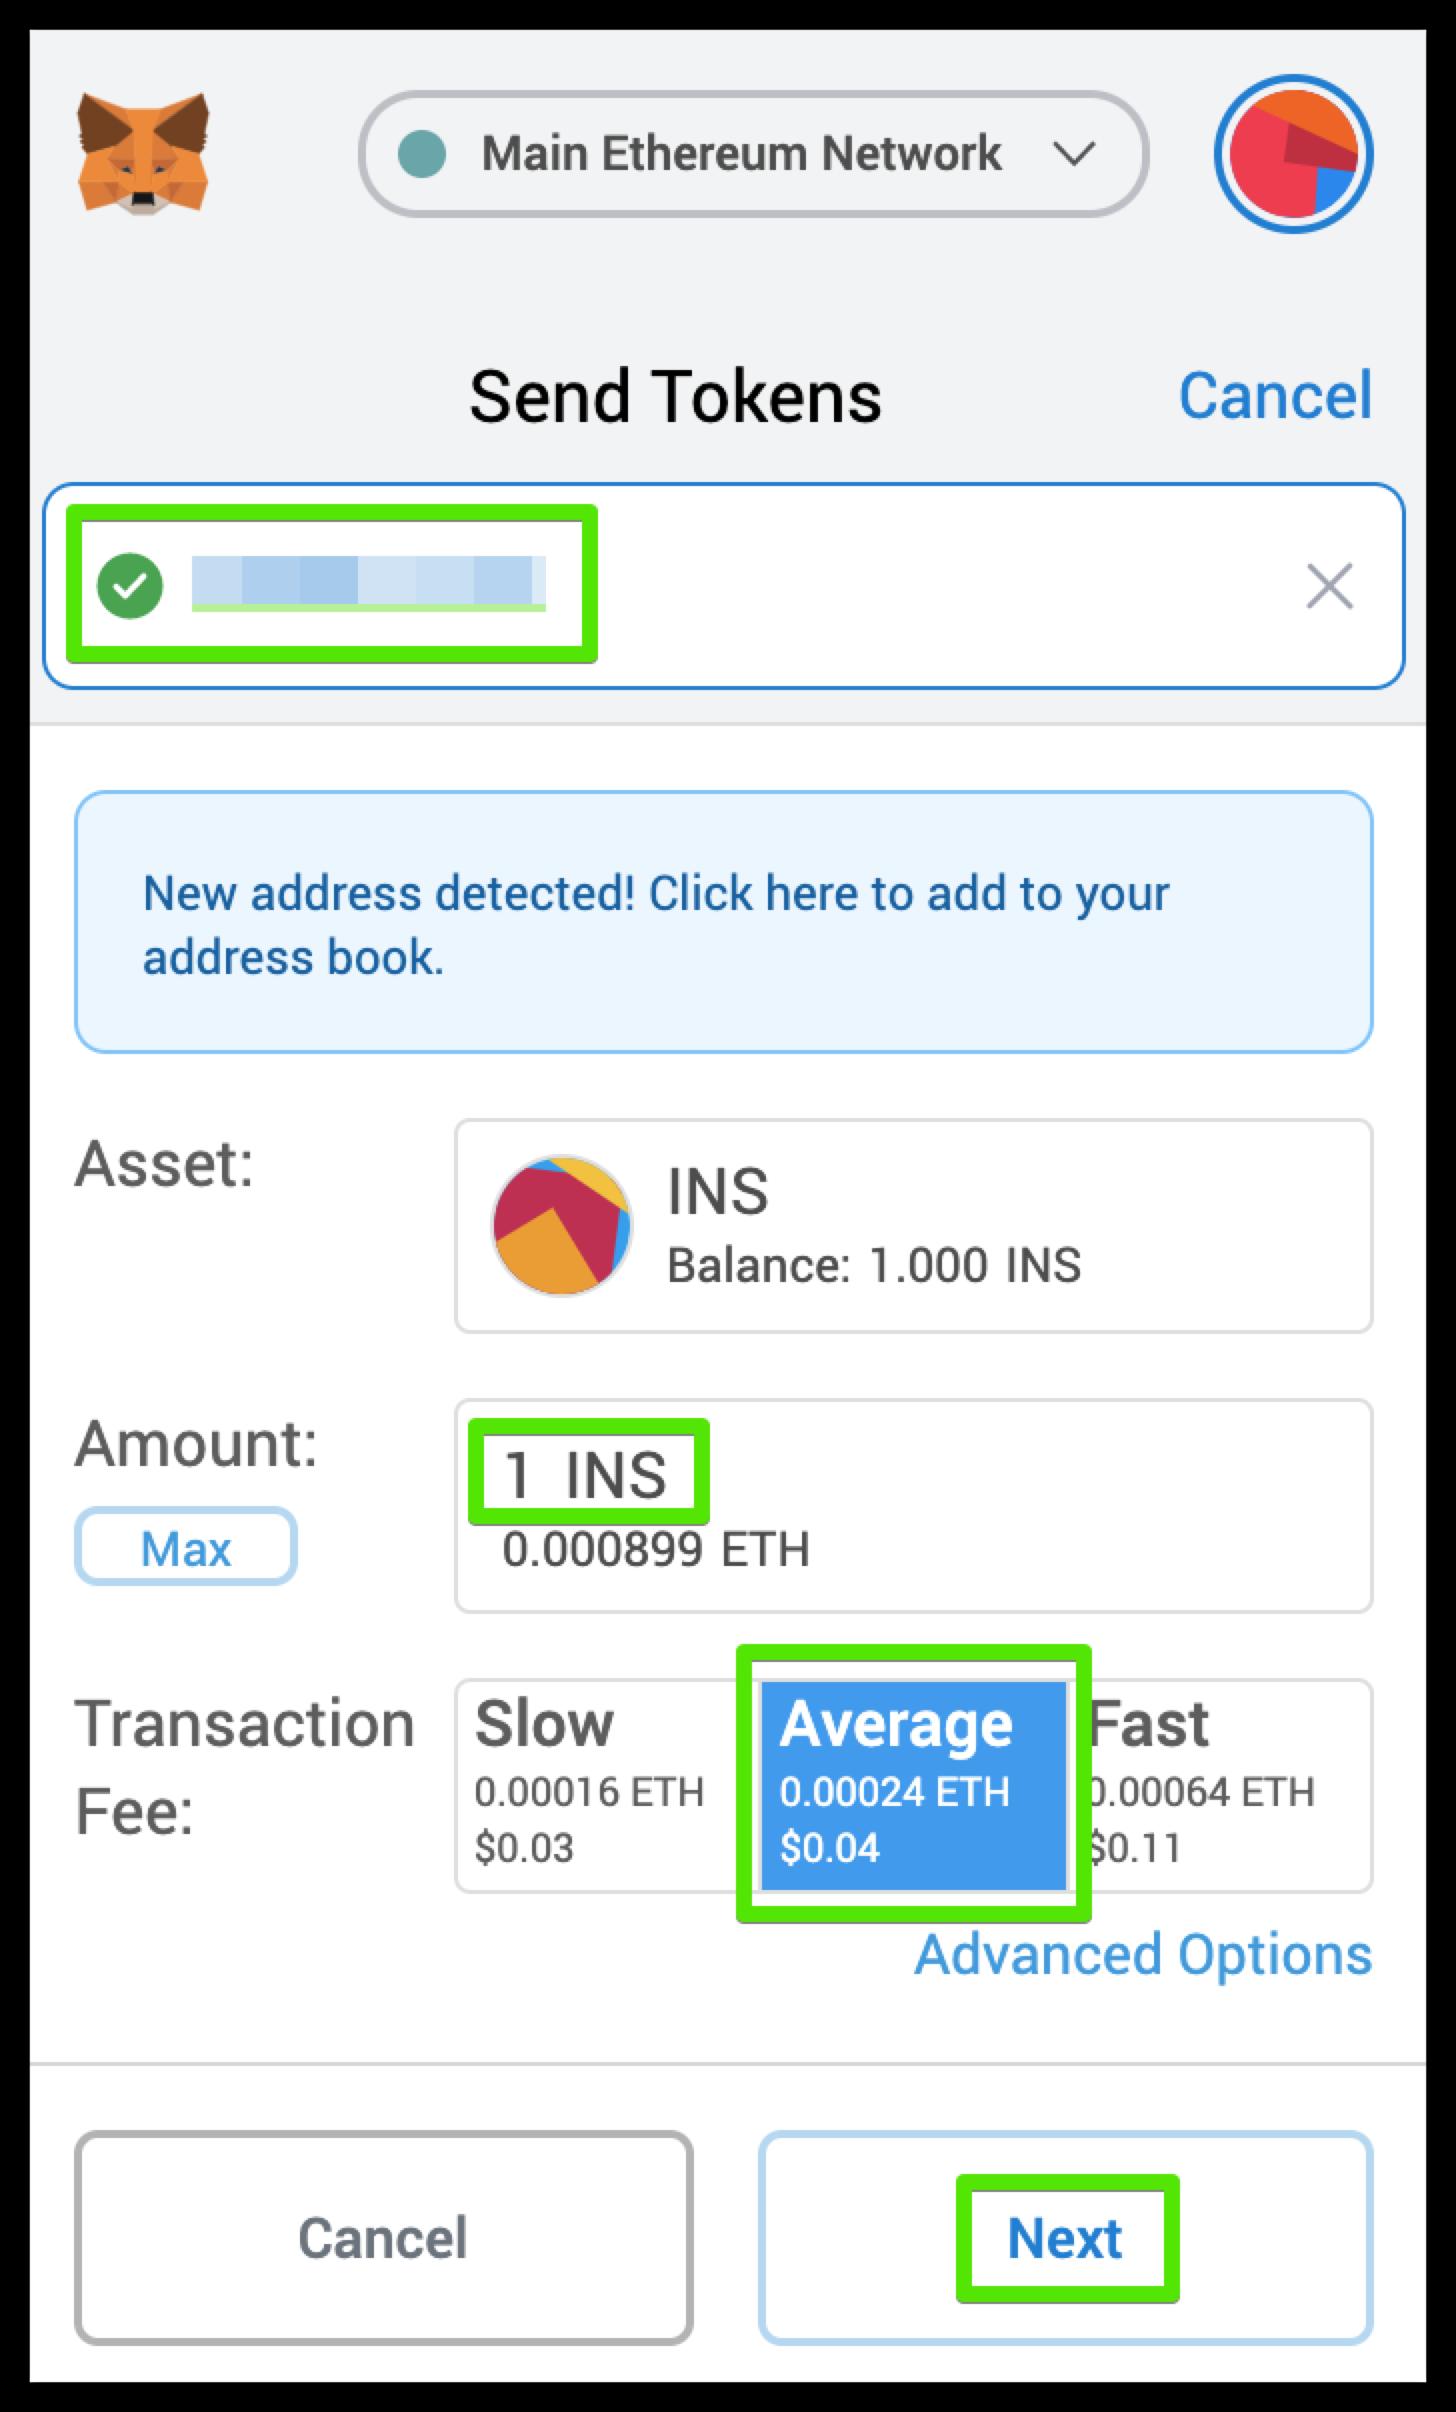 https://github.com/insolar/doc-pics/raw/master/mig-test/ins-transfer-details.png